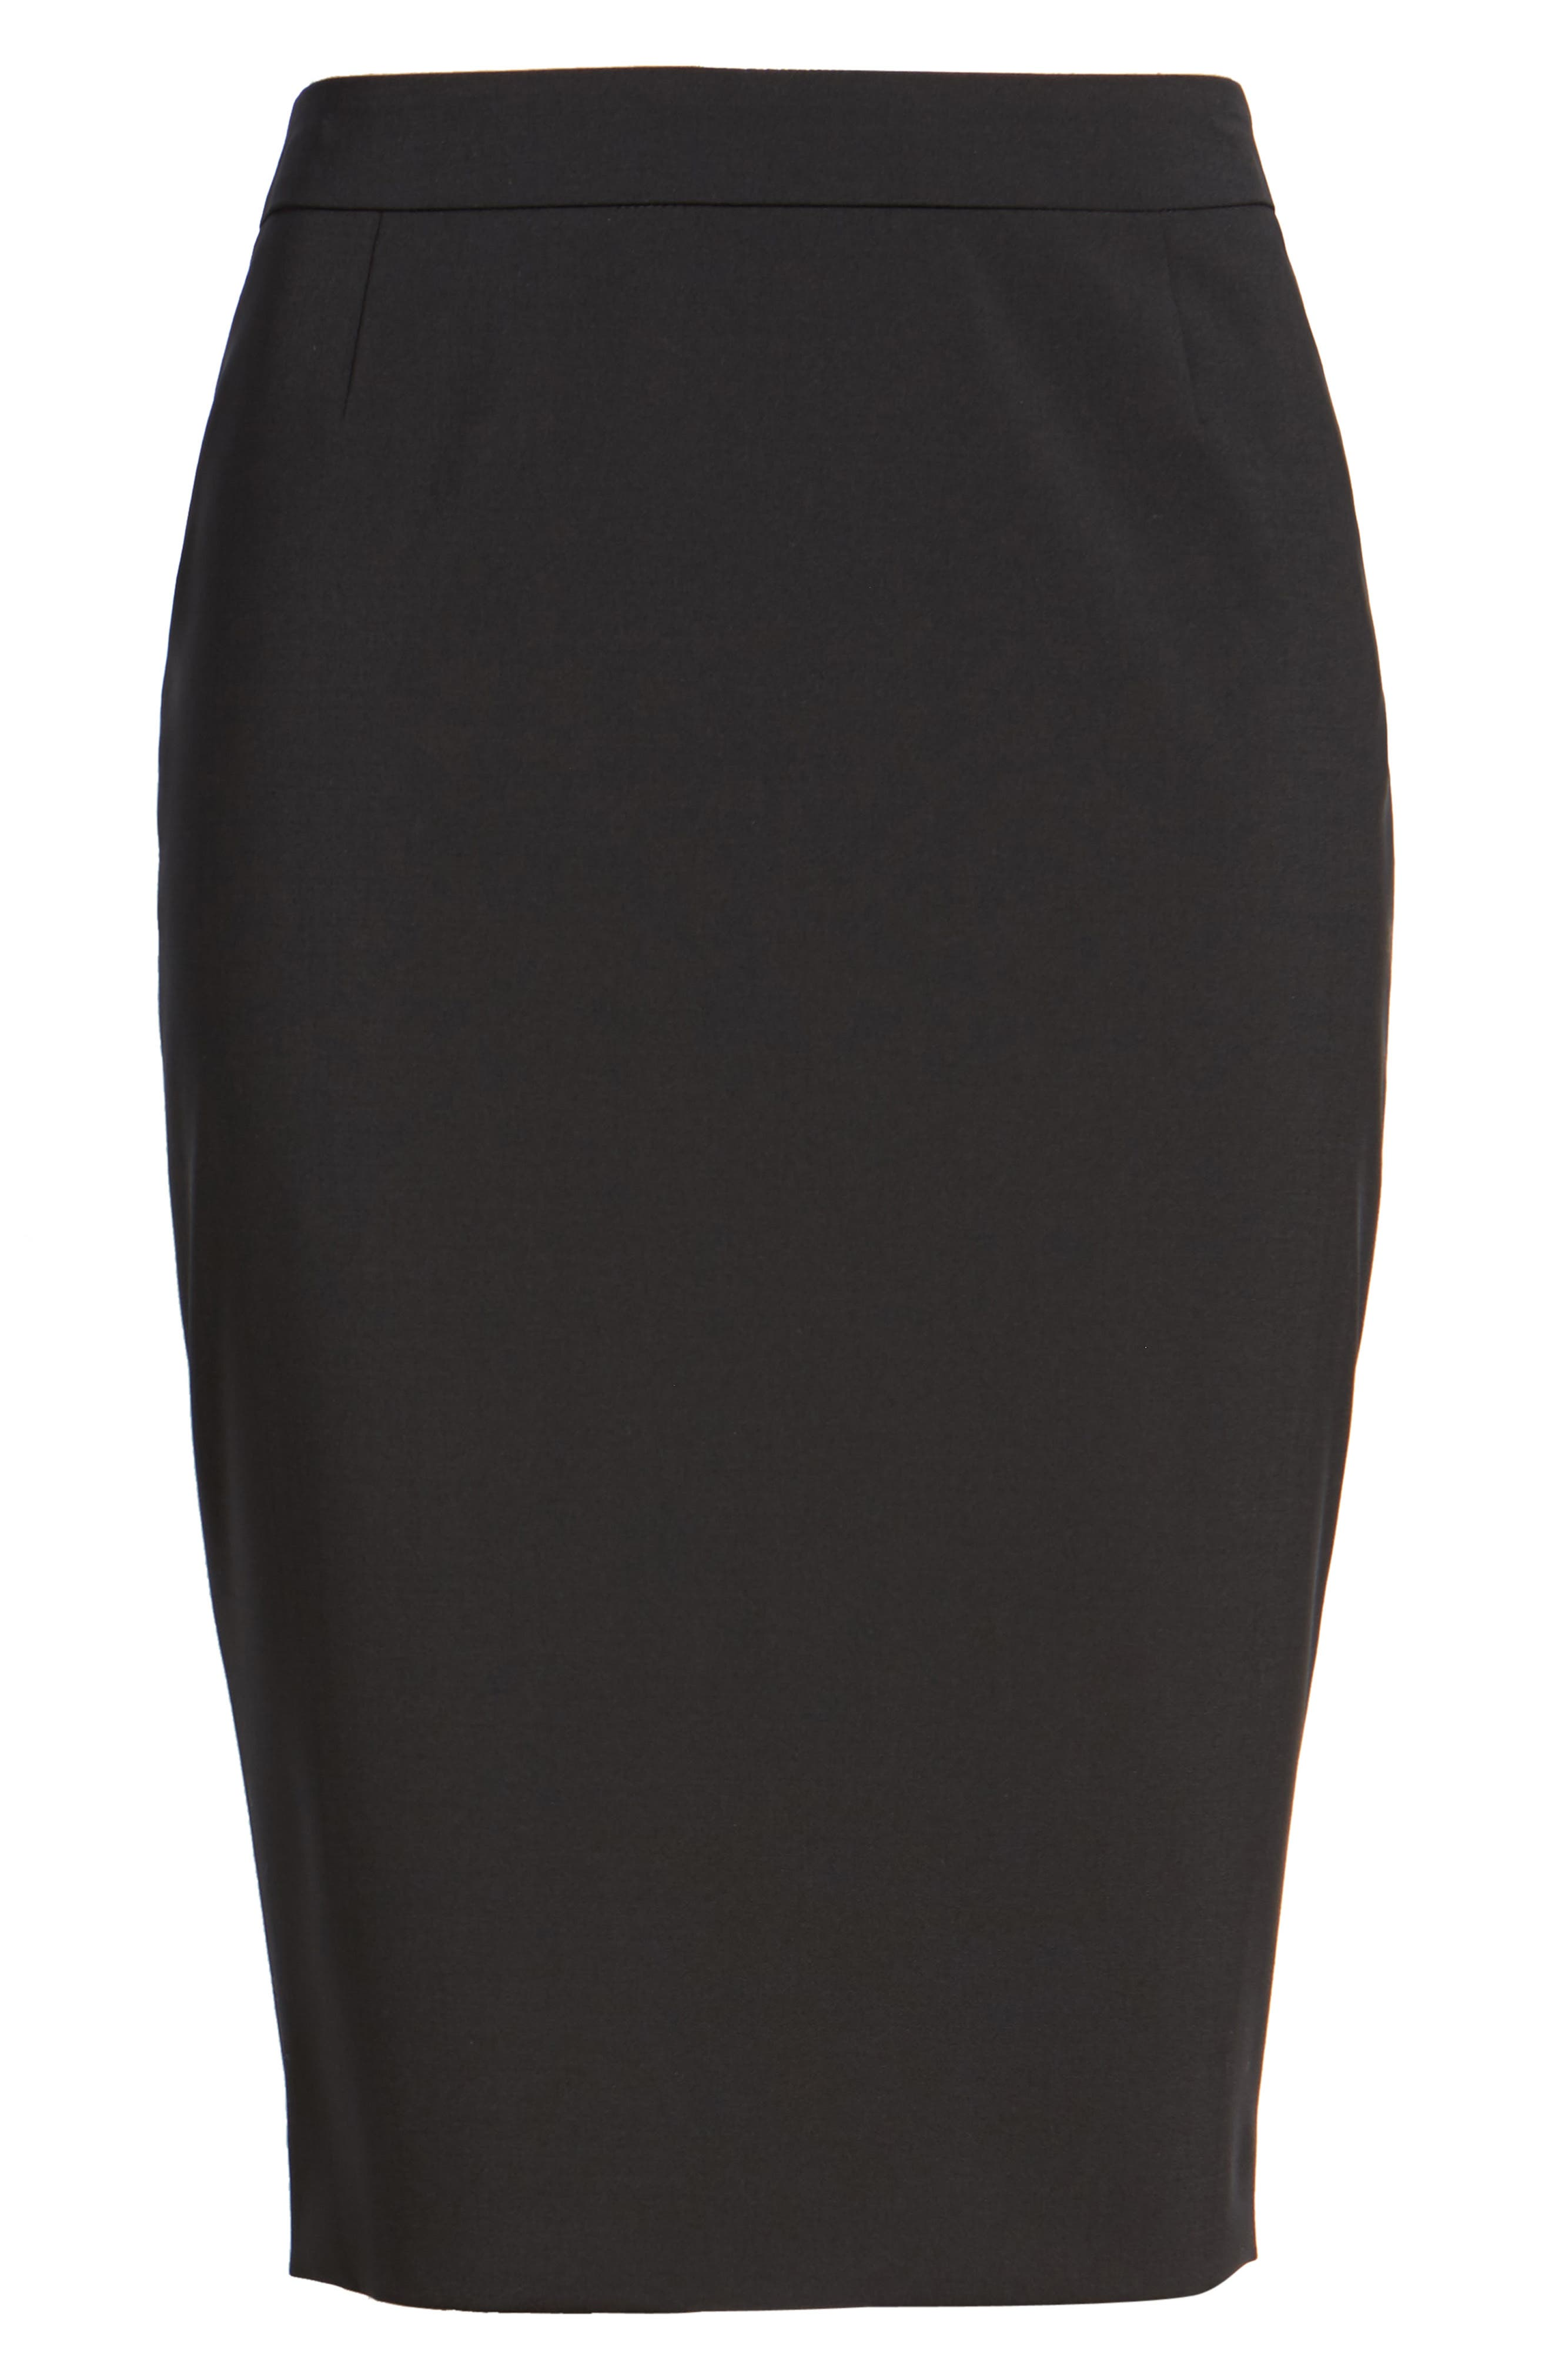 Vilea Tropical Stretch Wool Pencil Skirt,                         Main,                         color, BLACK